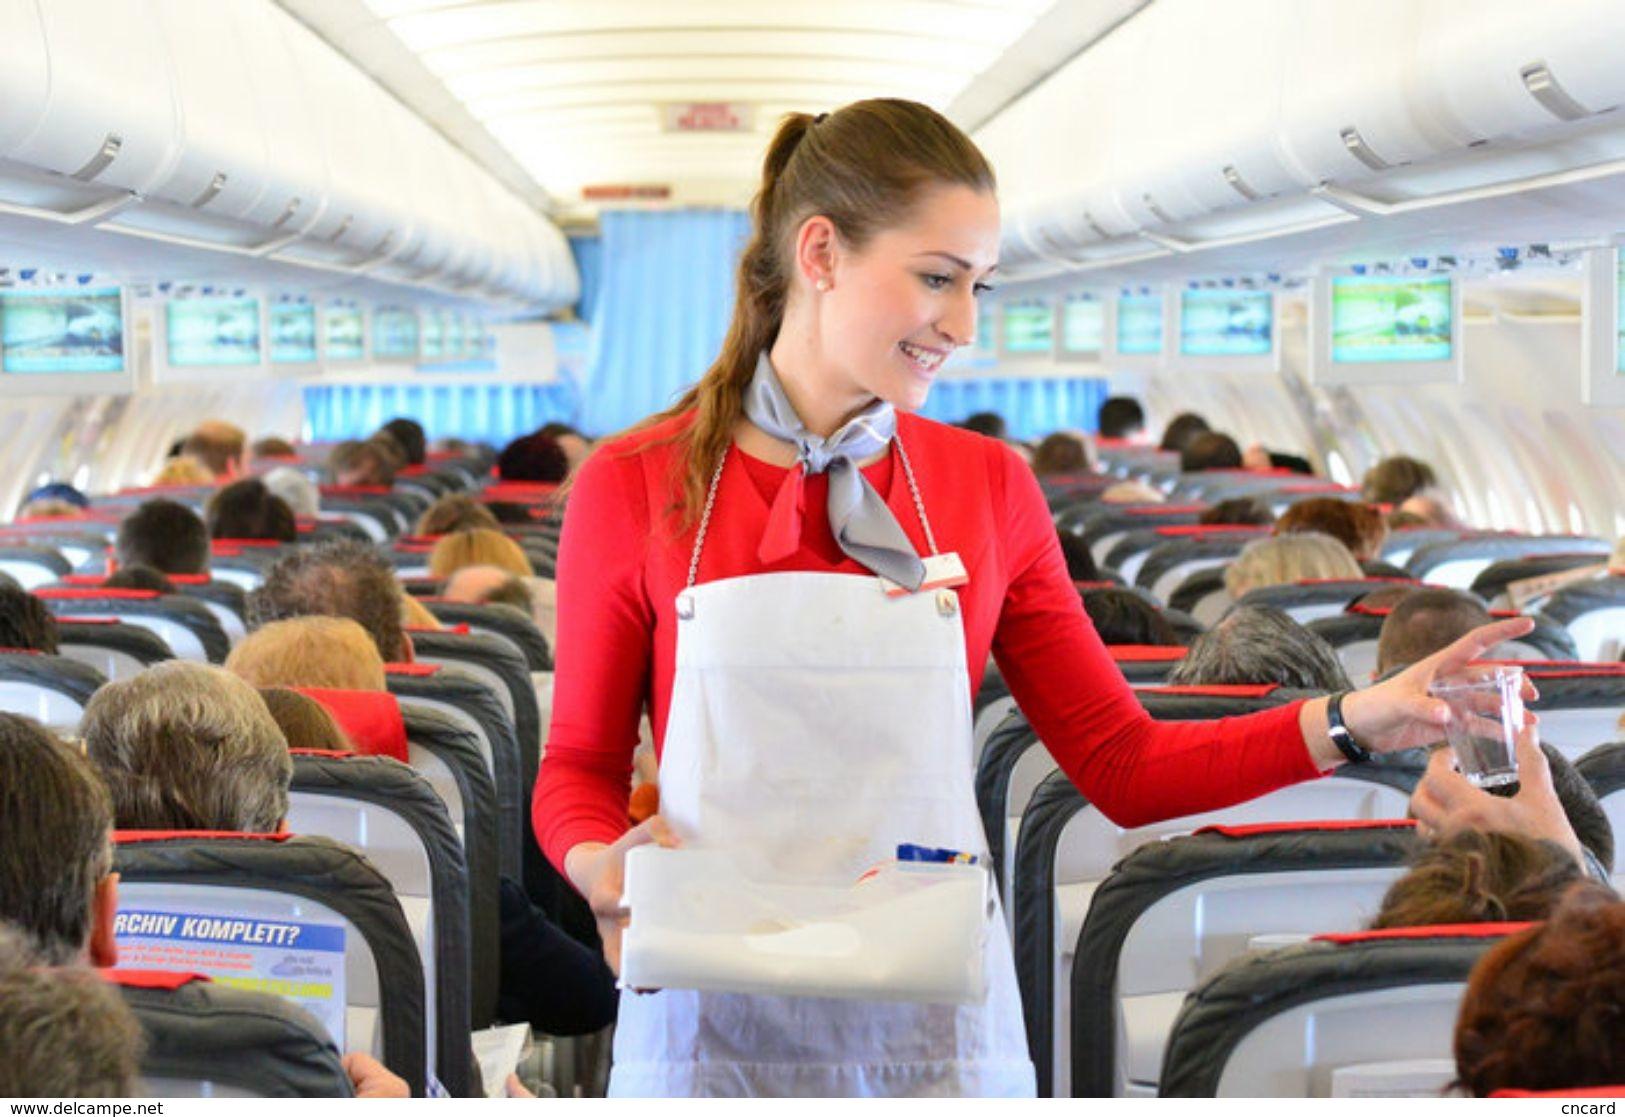 T80-120 ]  Flight Attendants Air Attendants Stewardesses Hostesses Cabin Crew , China Pre-paid Card, Postal Stationery - Jobs